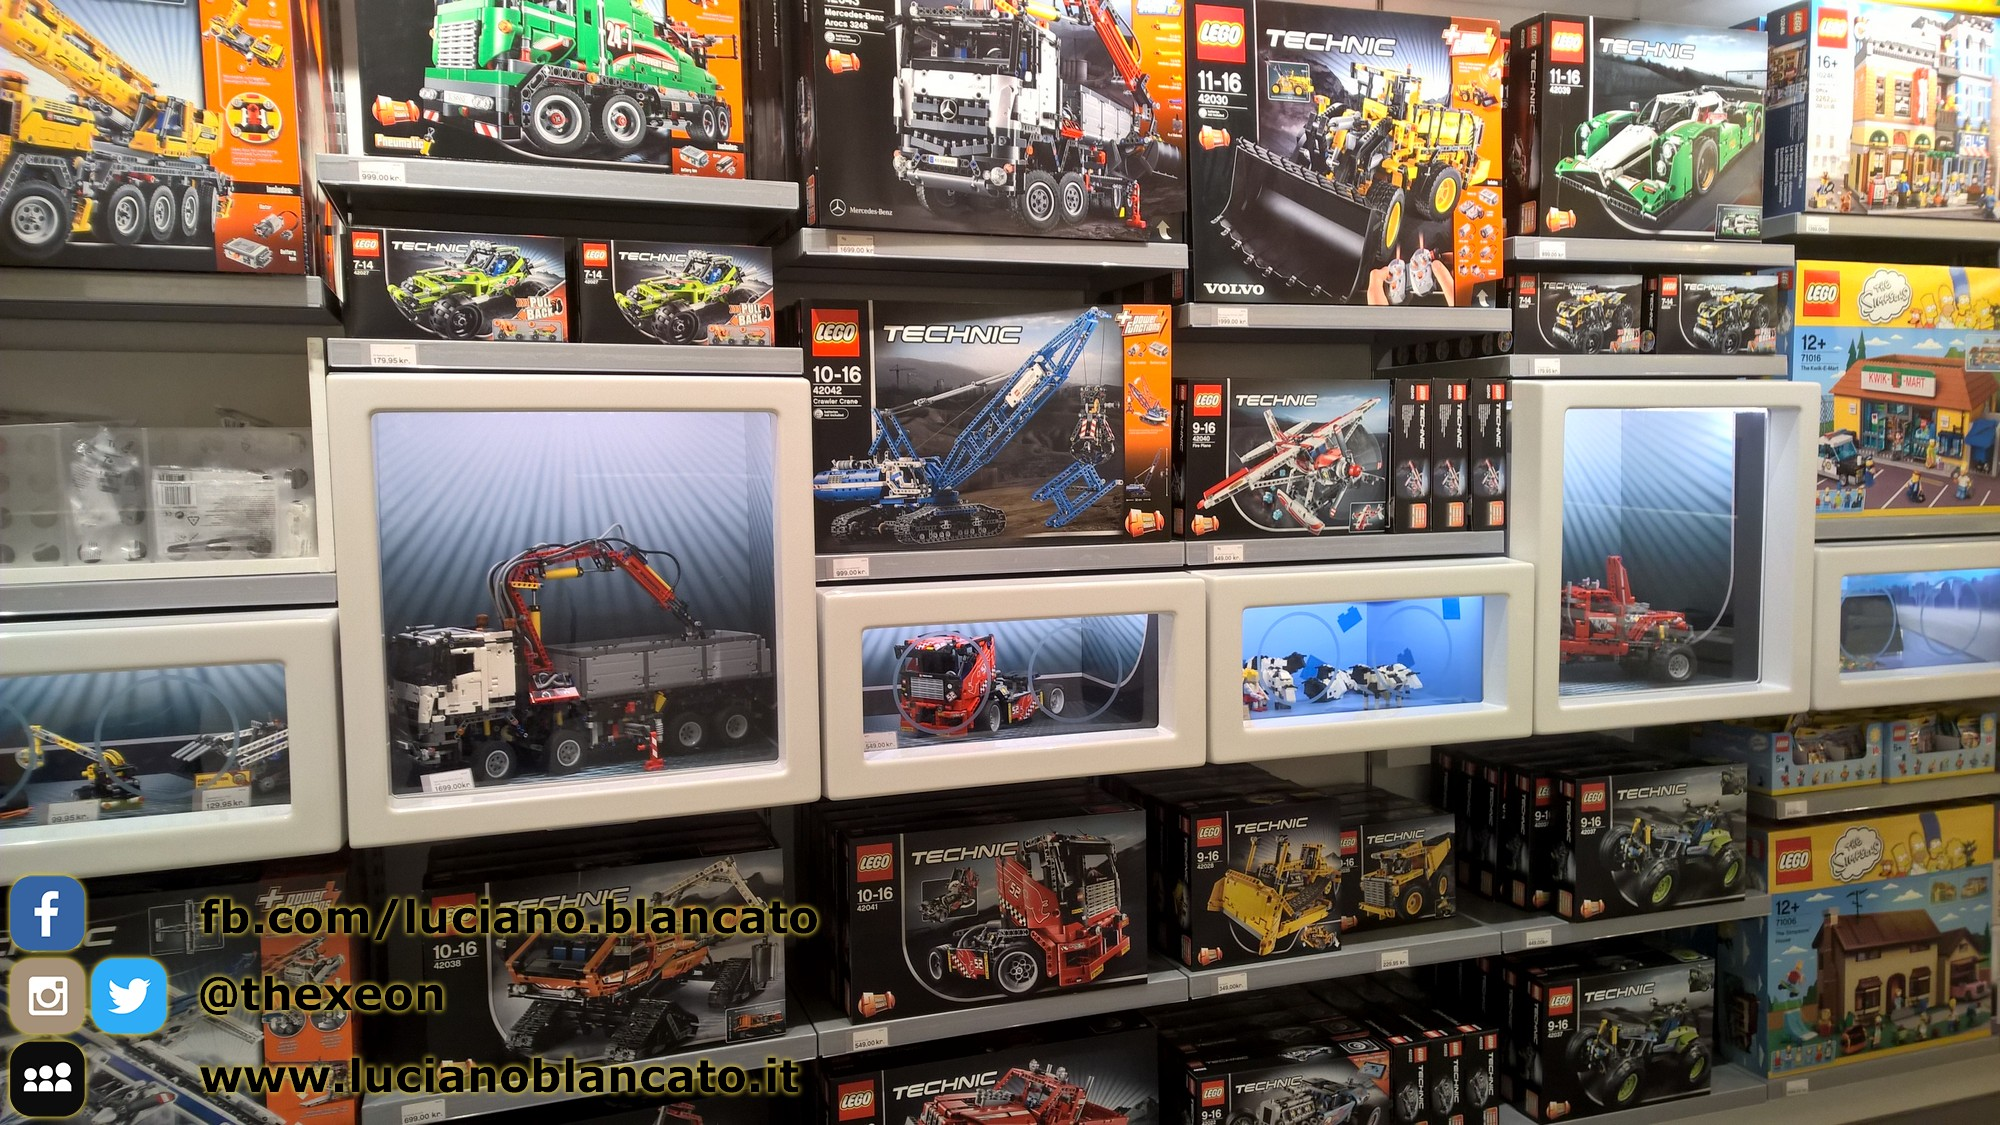 Lego store di Copenaghen - Danimarca